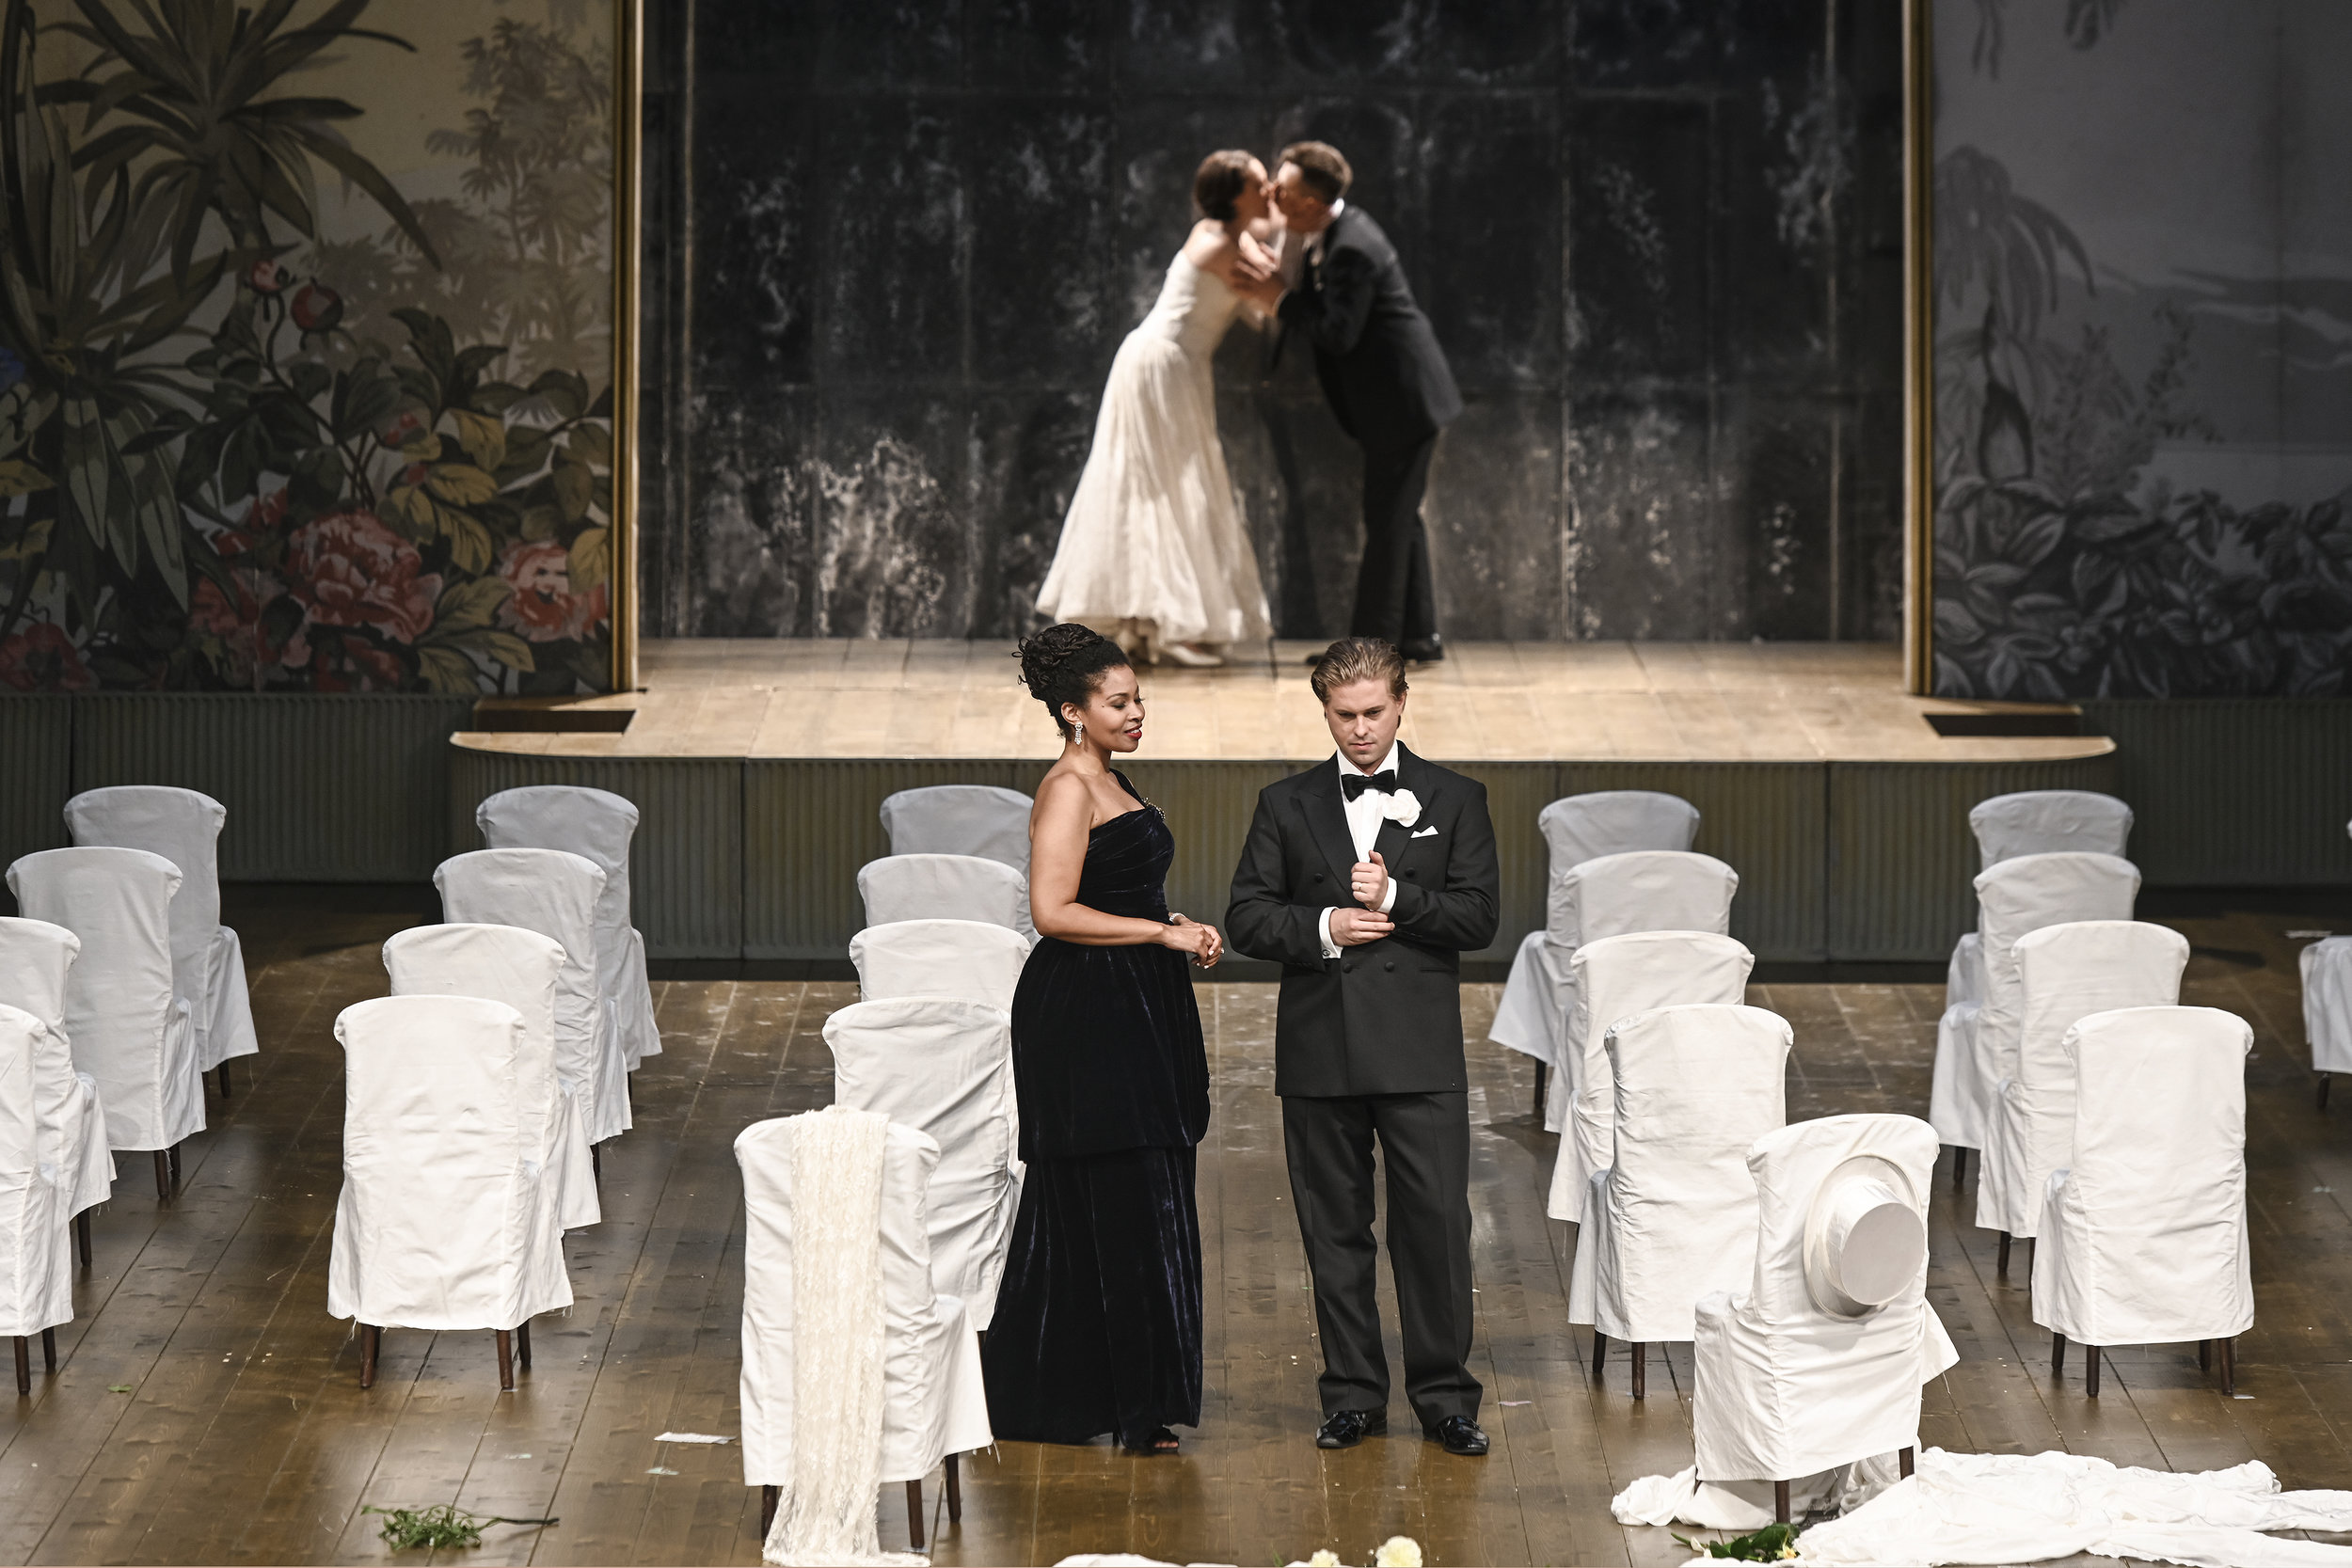 La Contessa in  Le nozze di Figaro  at Opernhaus Zürich, June & July 2019 Photo by T+T Fotografie/Toni Suter and the Opernhaus Zürich.